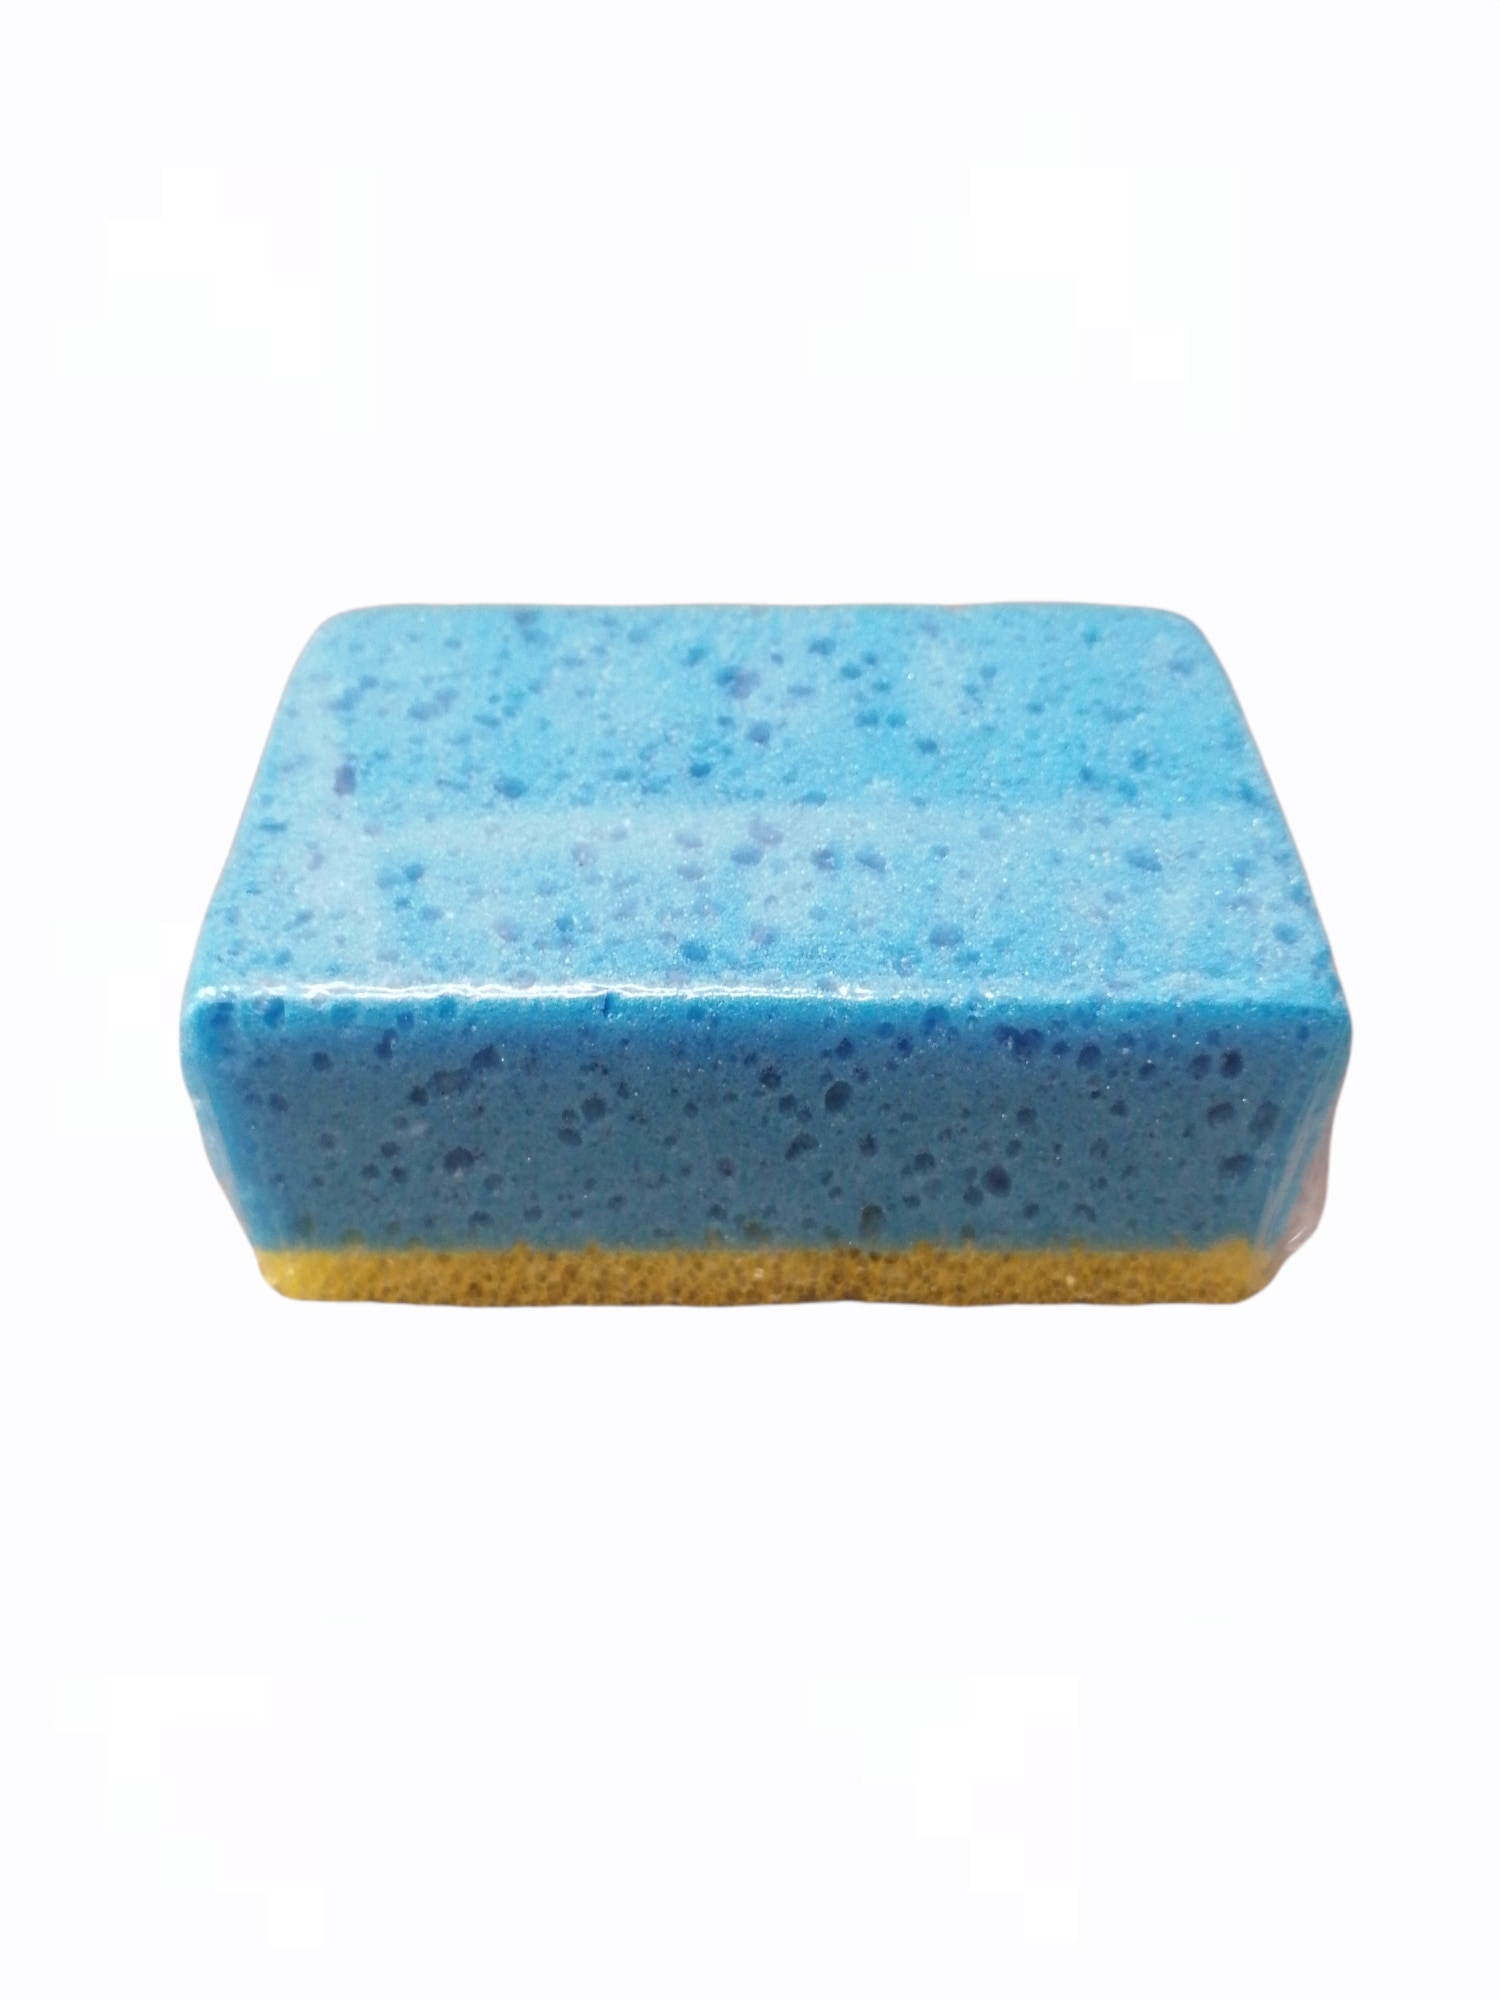 Horse sponge